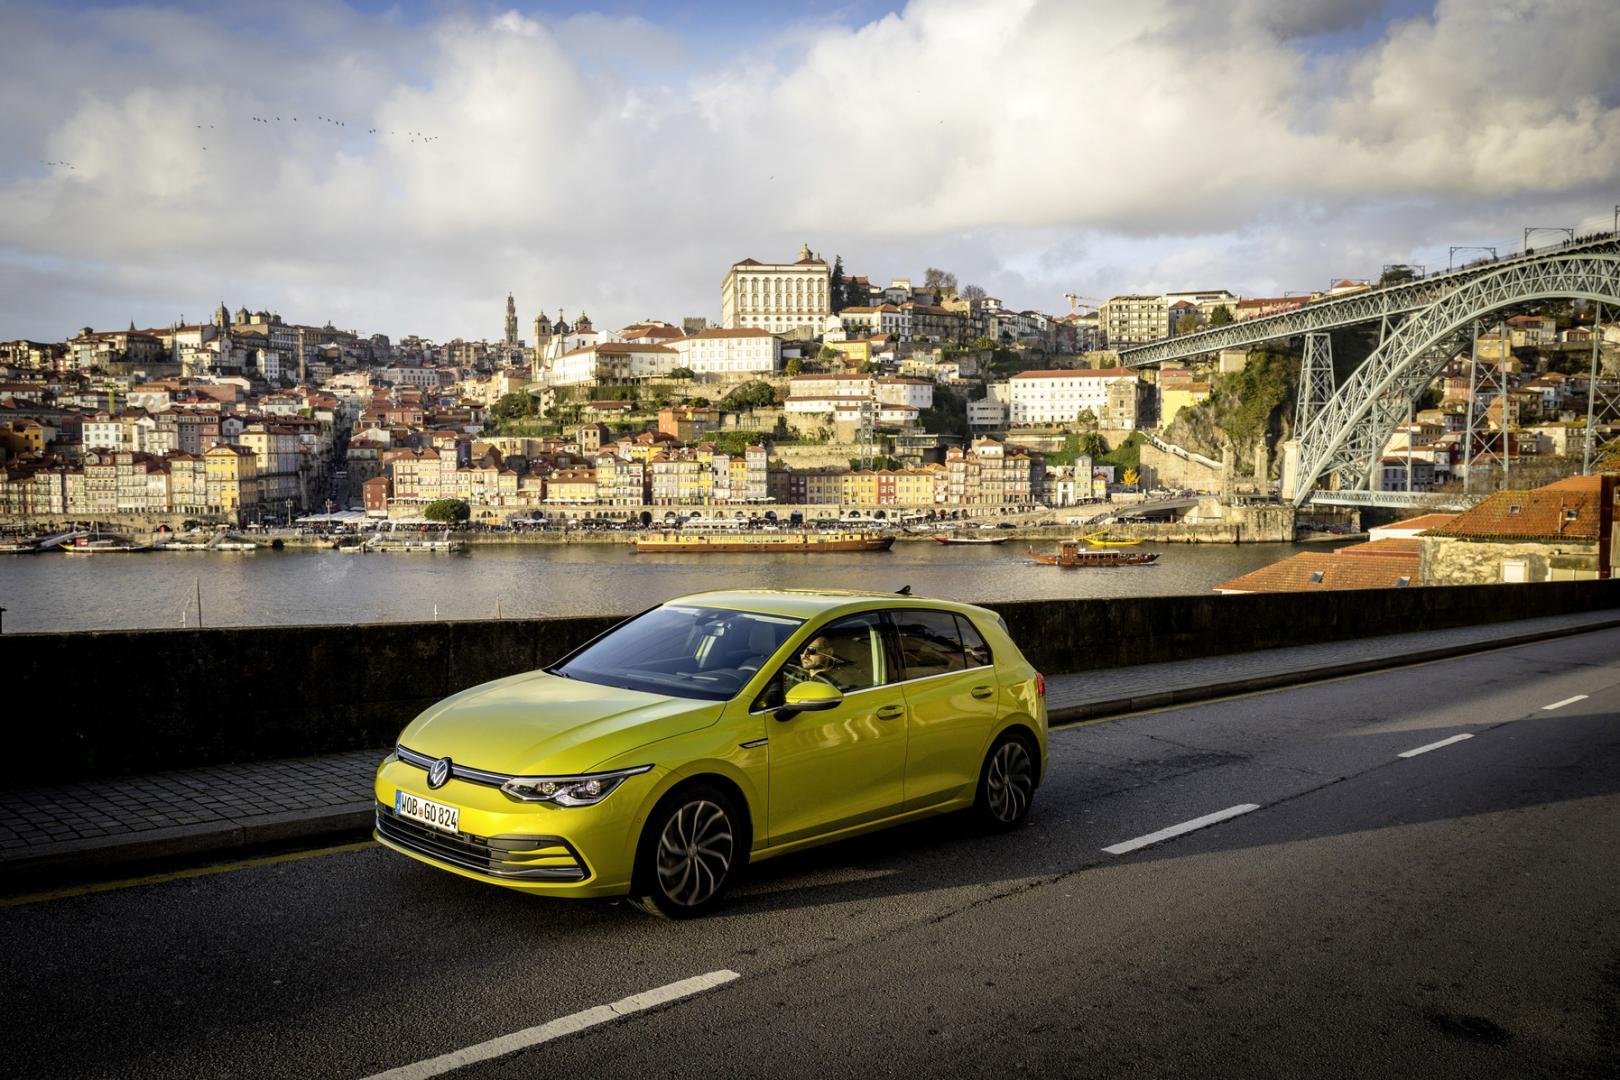 Best-selling cars in the UK - Volkswagen Golf